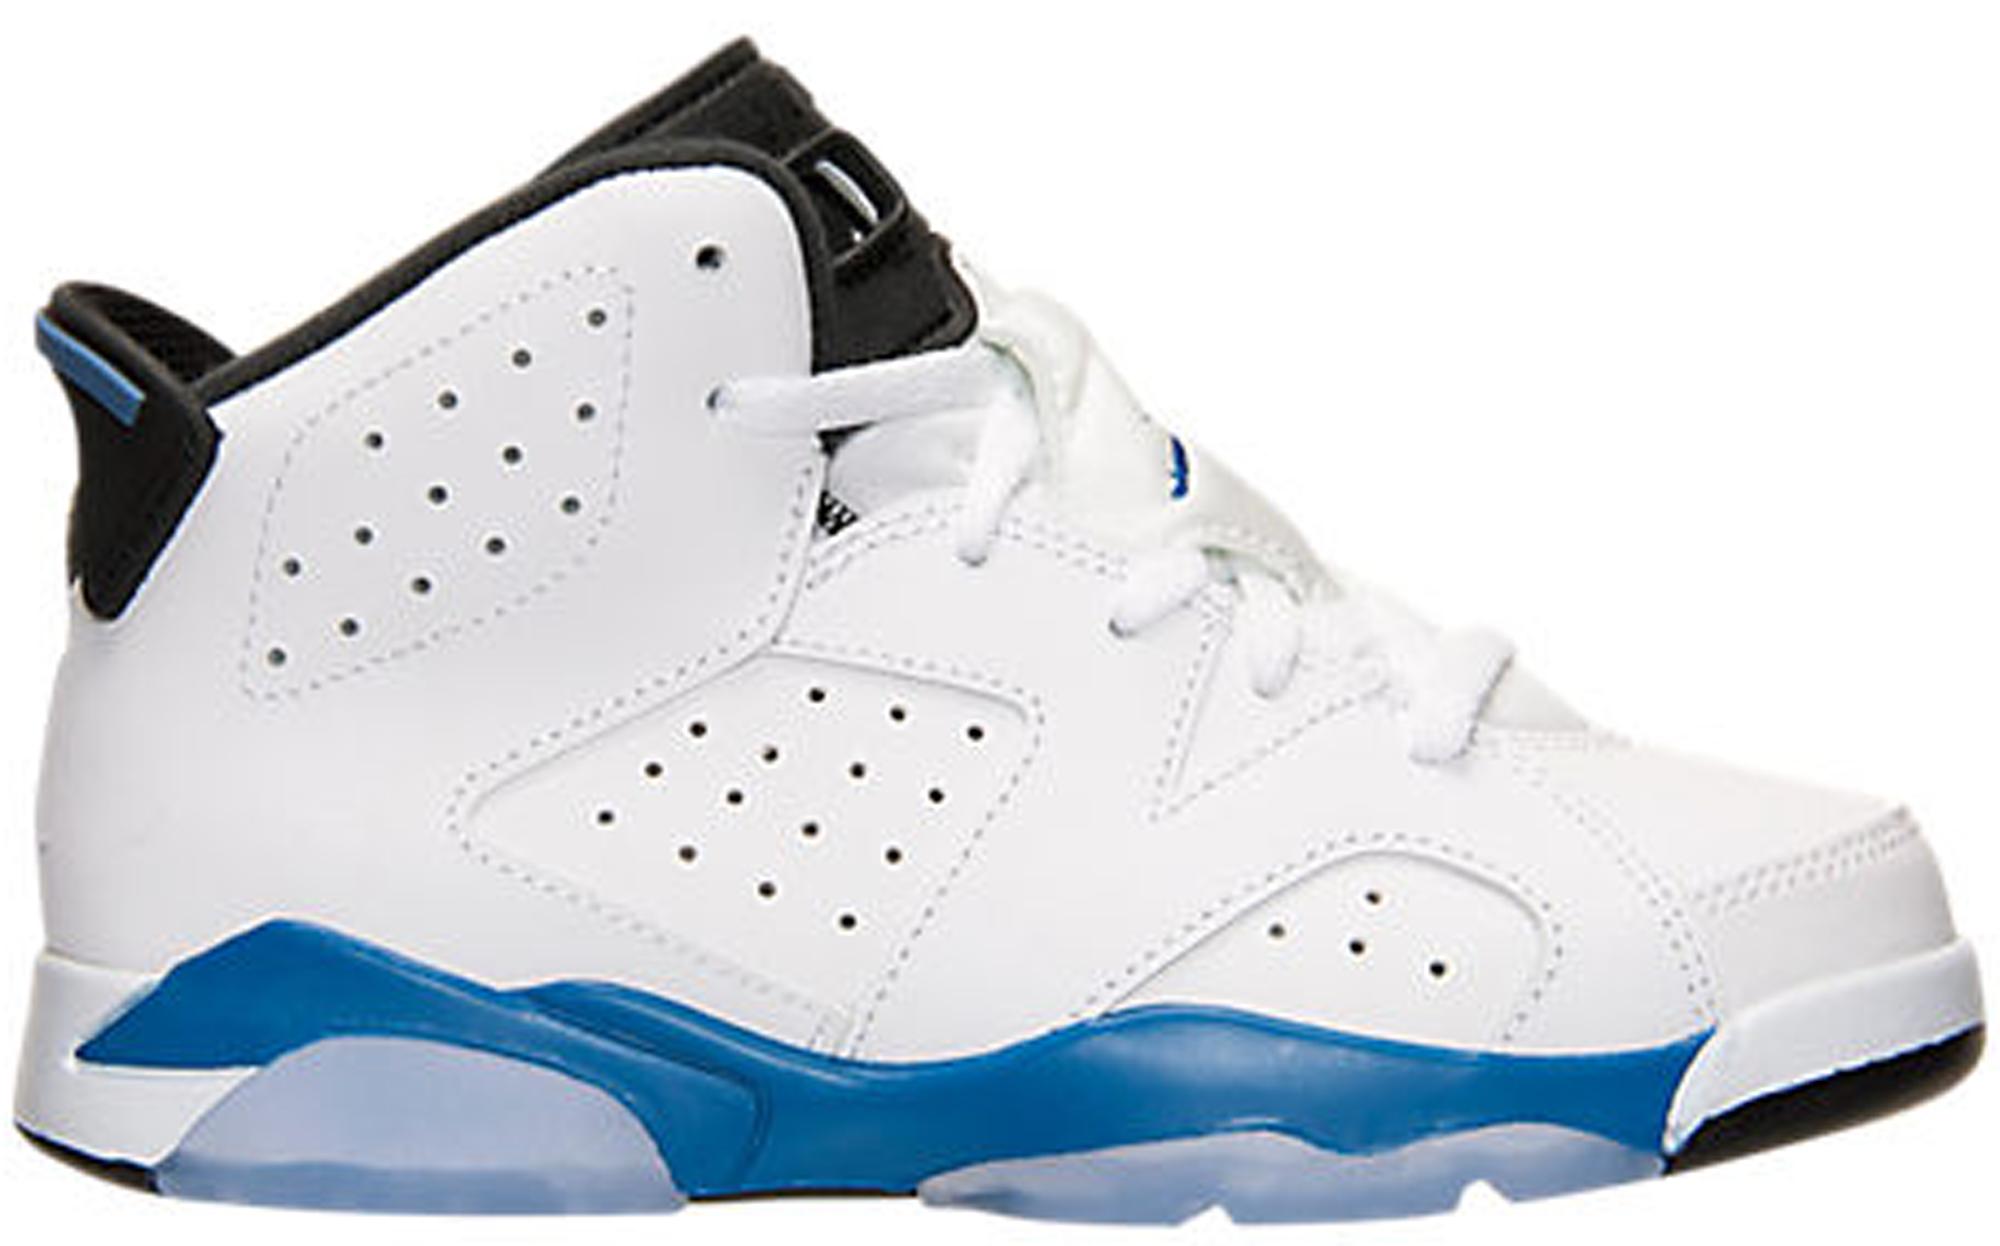 Jordan 6 Retro Sport Blue (PS) - 384666-107